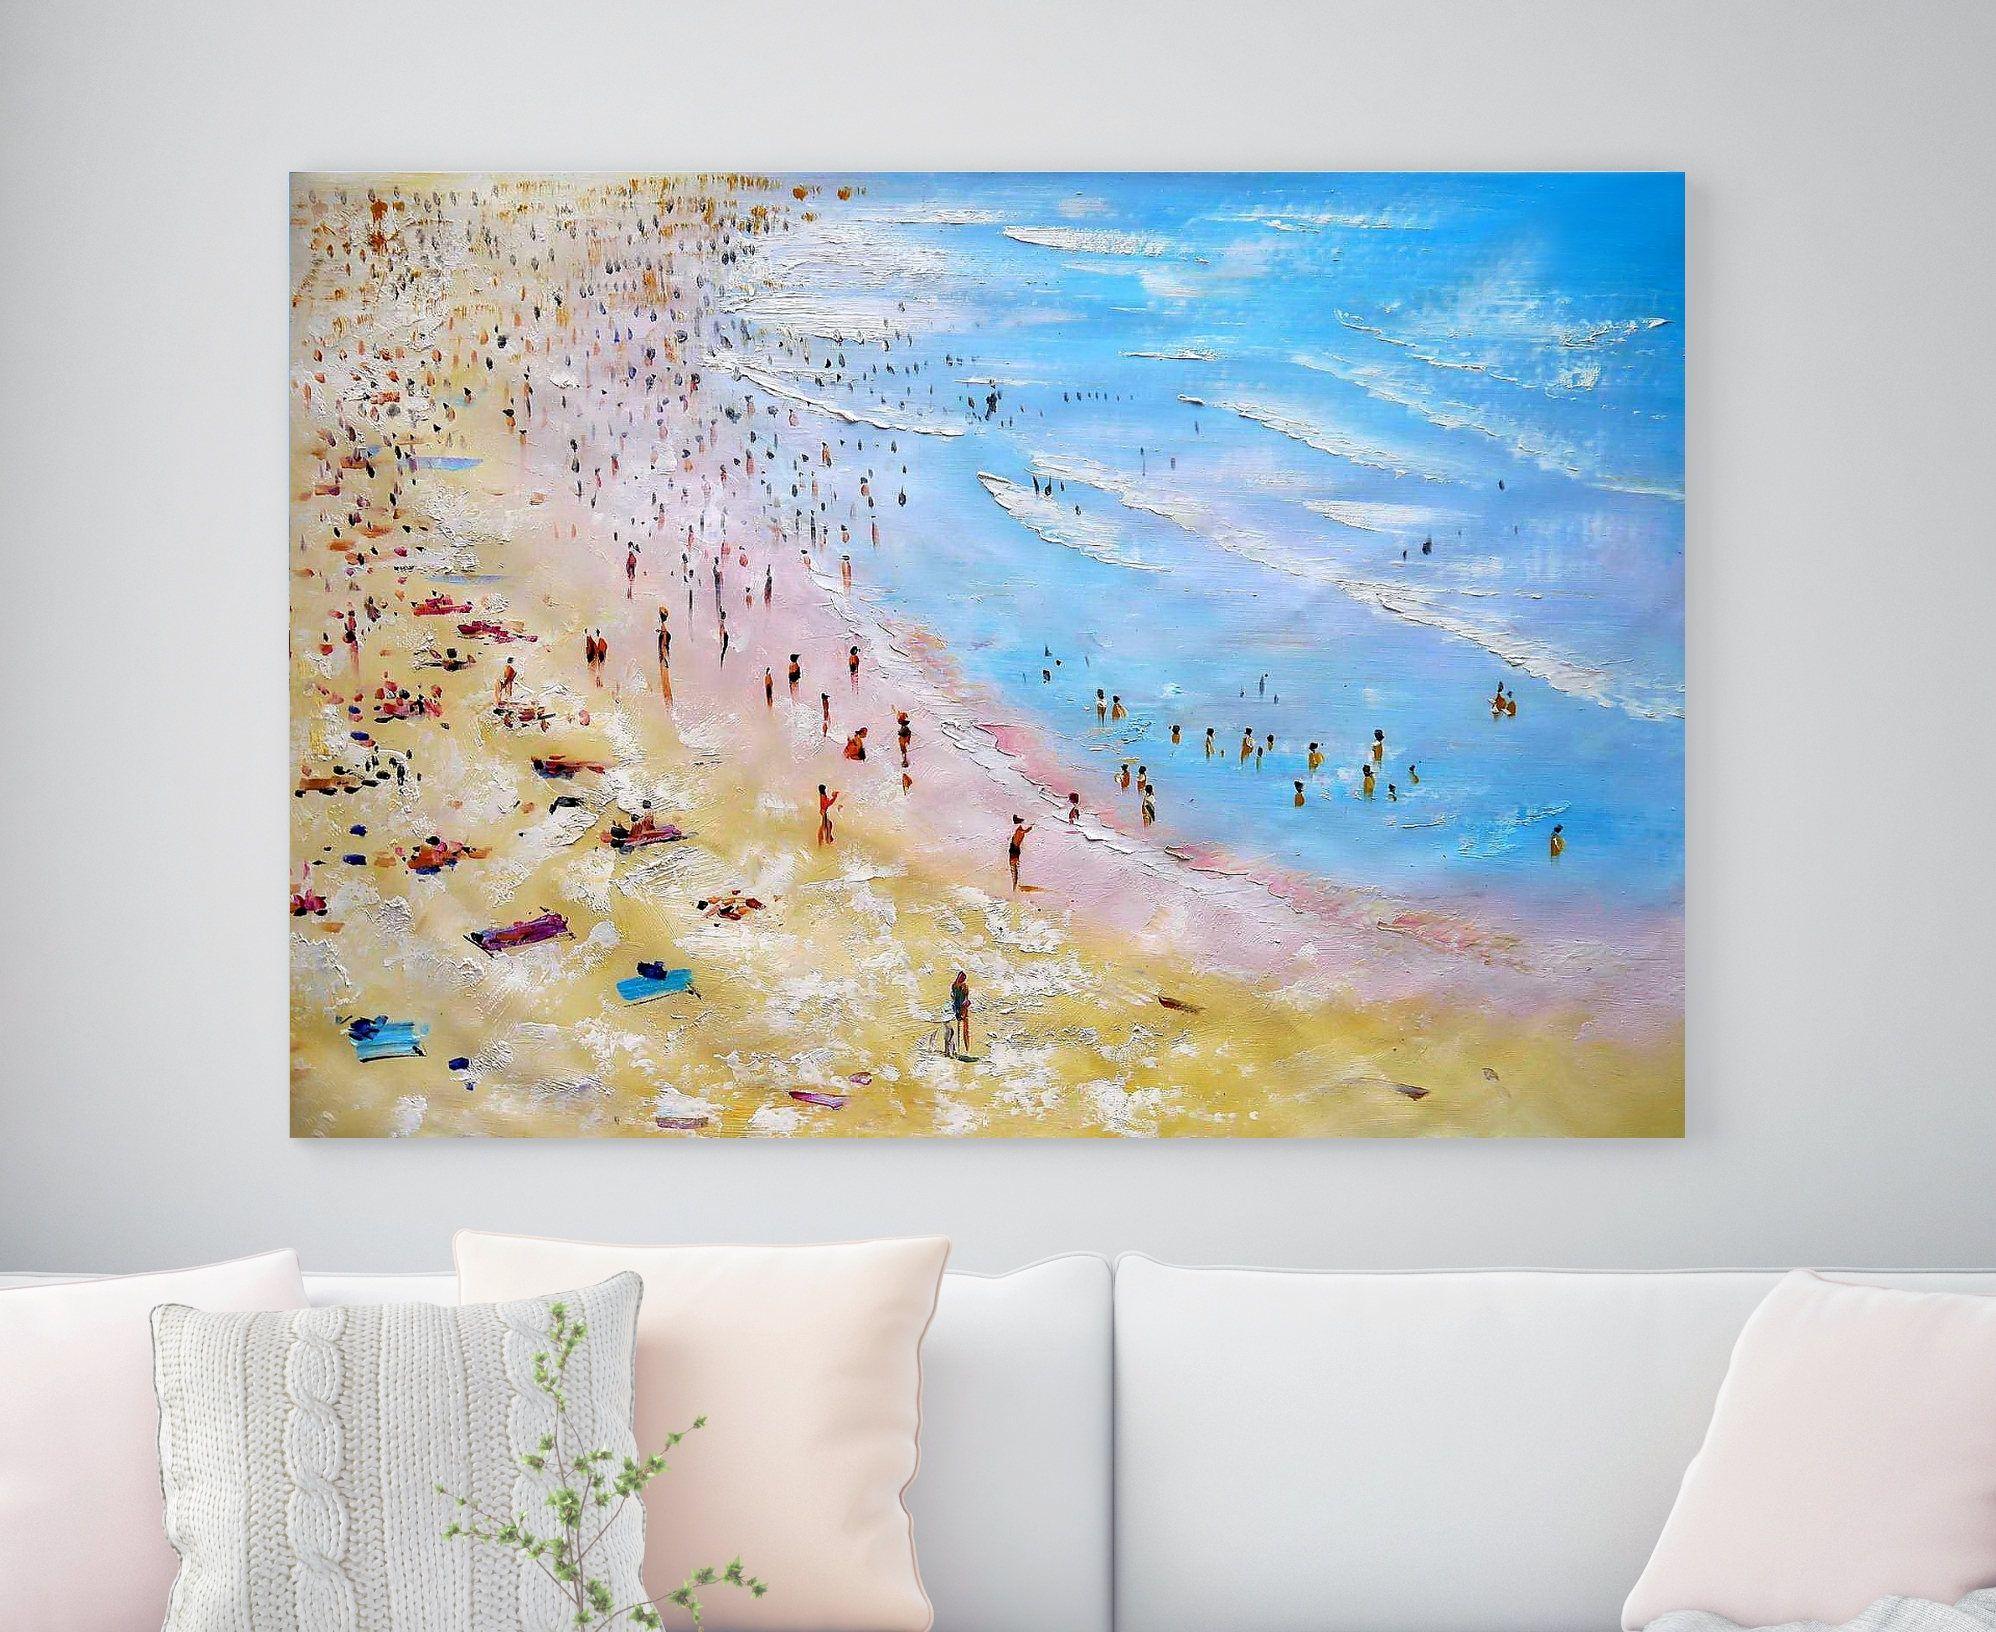 Large Original Oil Painting Canvas Wall Art Salon Painting Huge